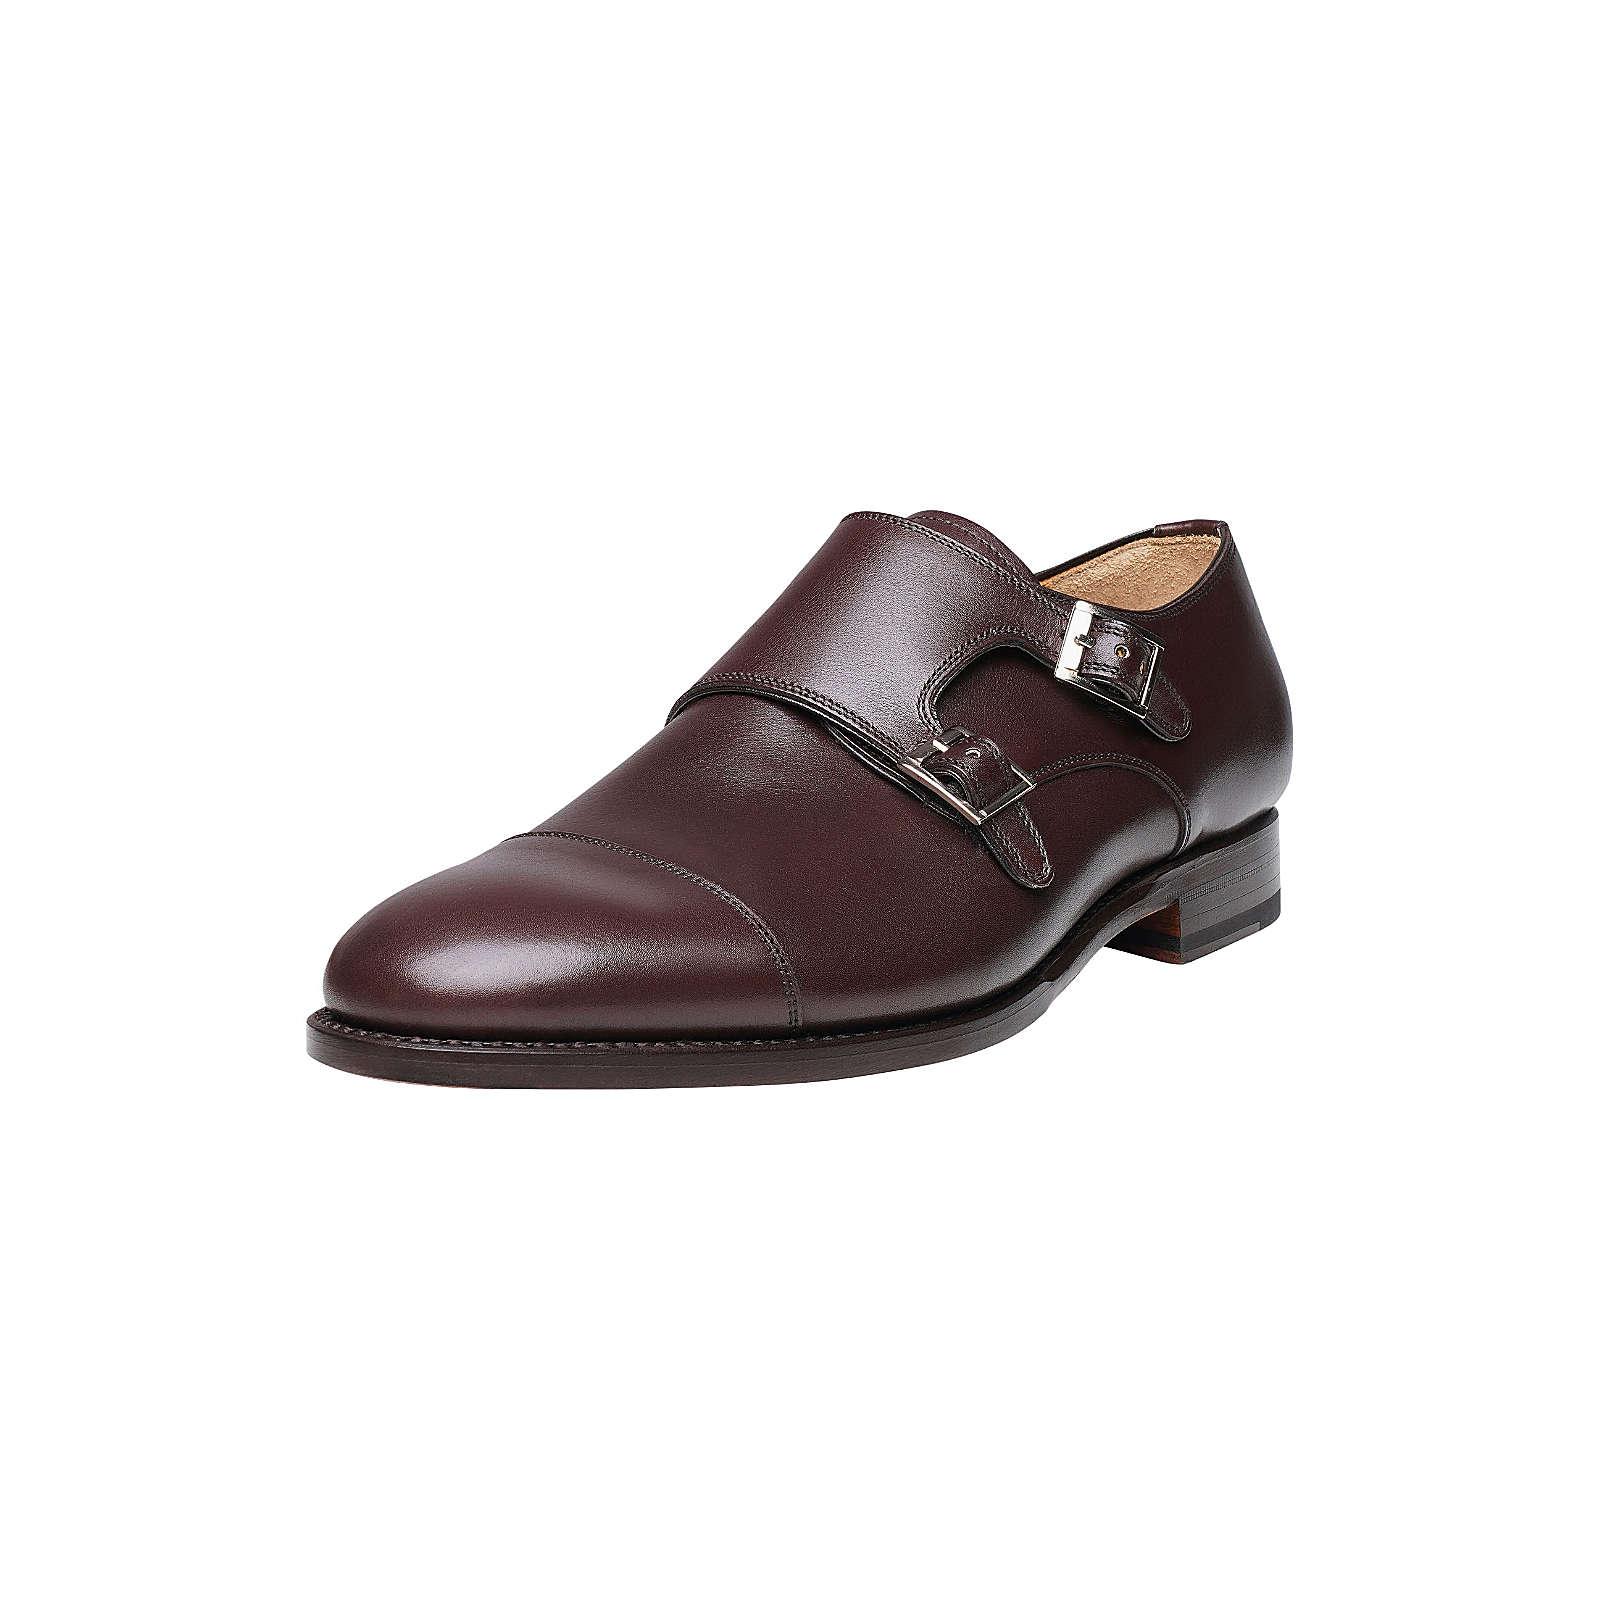 SHOEPASSION No. 591 Business Schuhe dunkelbraun Herren Gr. 44